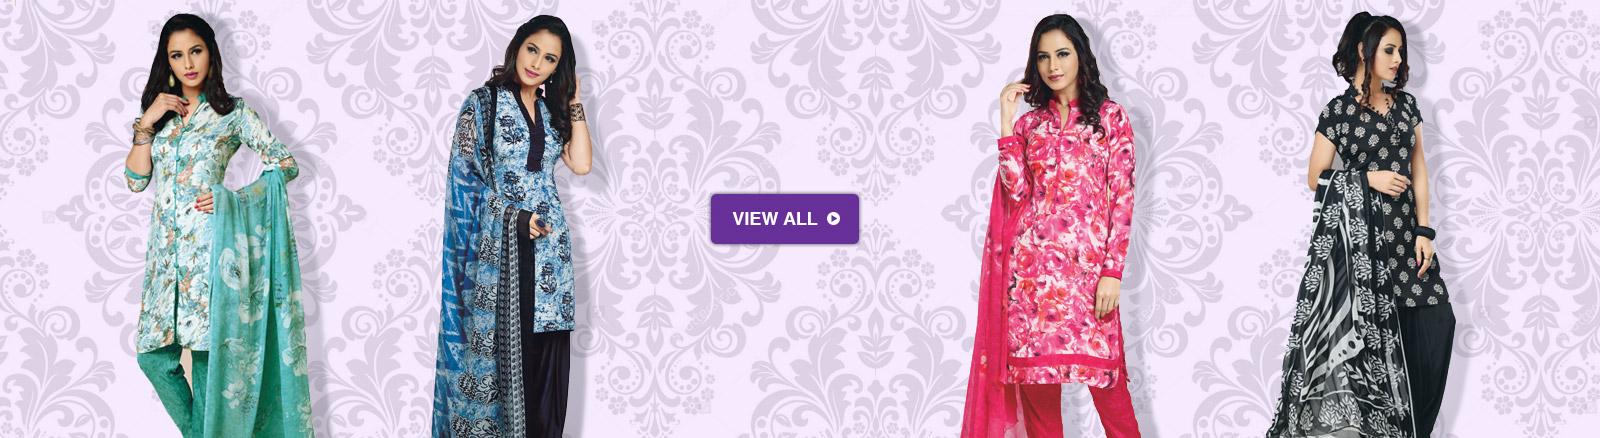 32fcdec8a3cd8 Printed Cotton Kurtis and Tunics · unstitched salwar kameez online ...